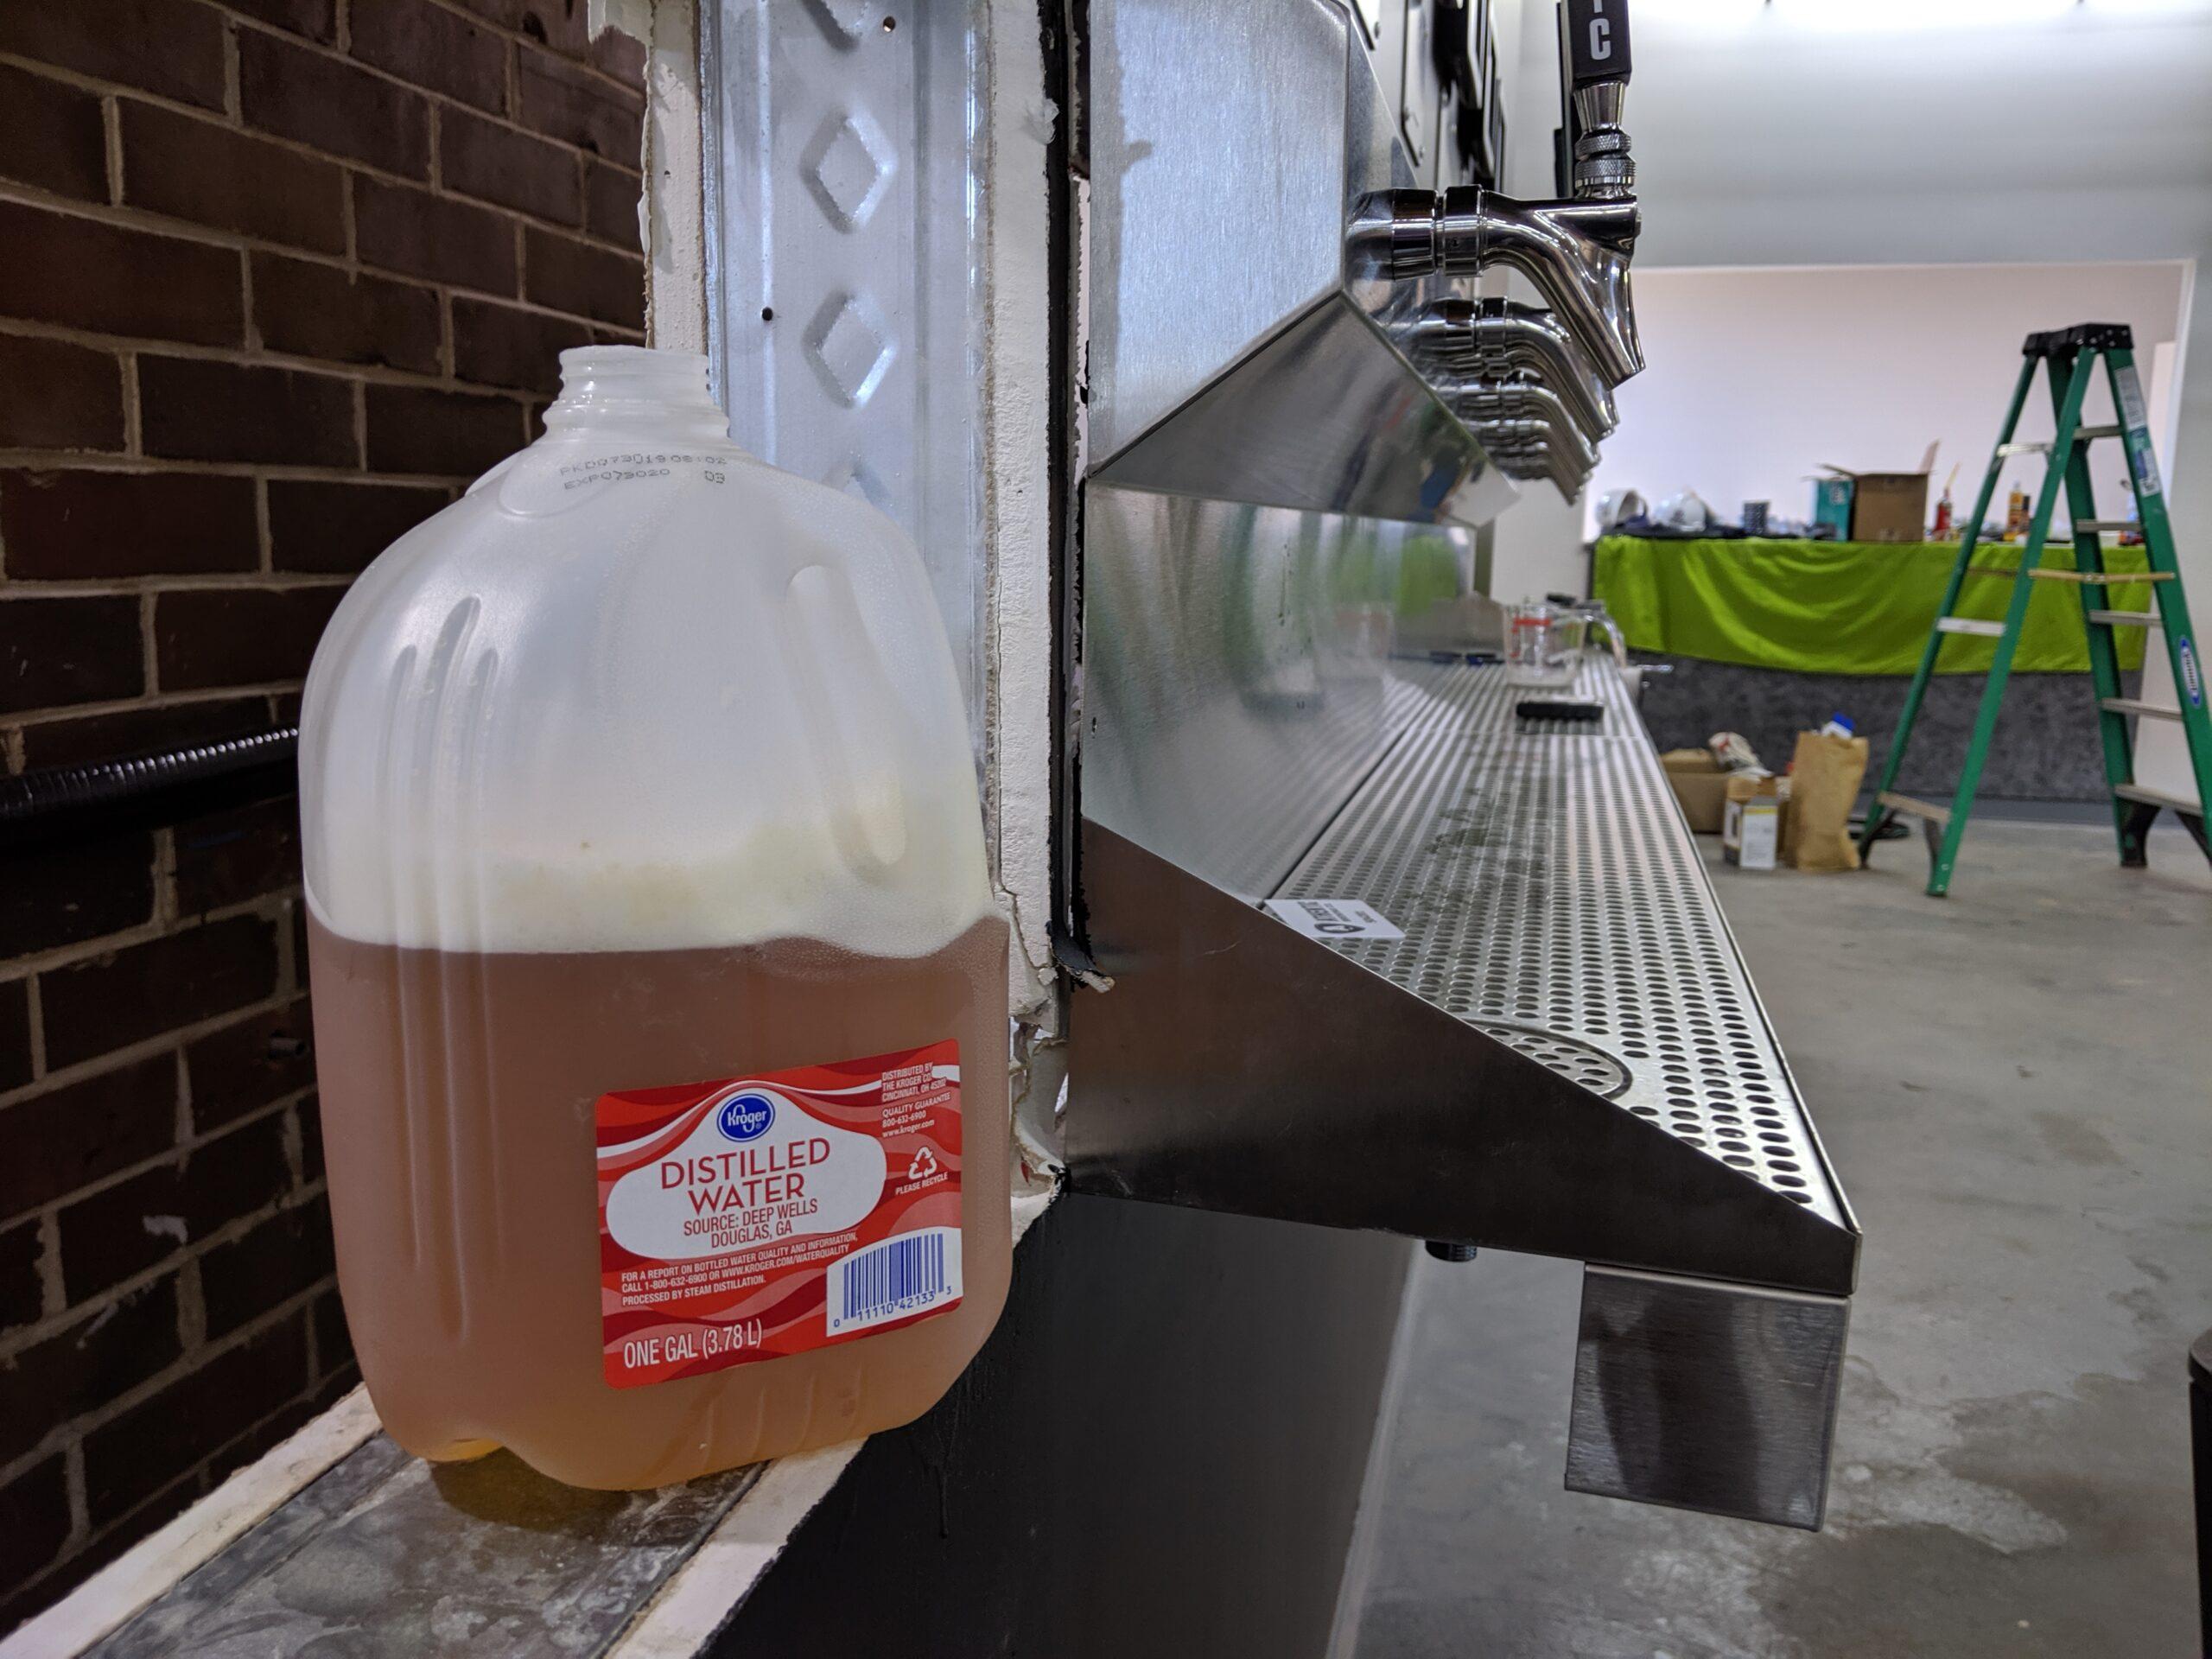 is it beer in the milk jug